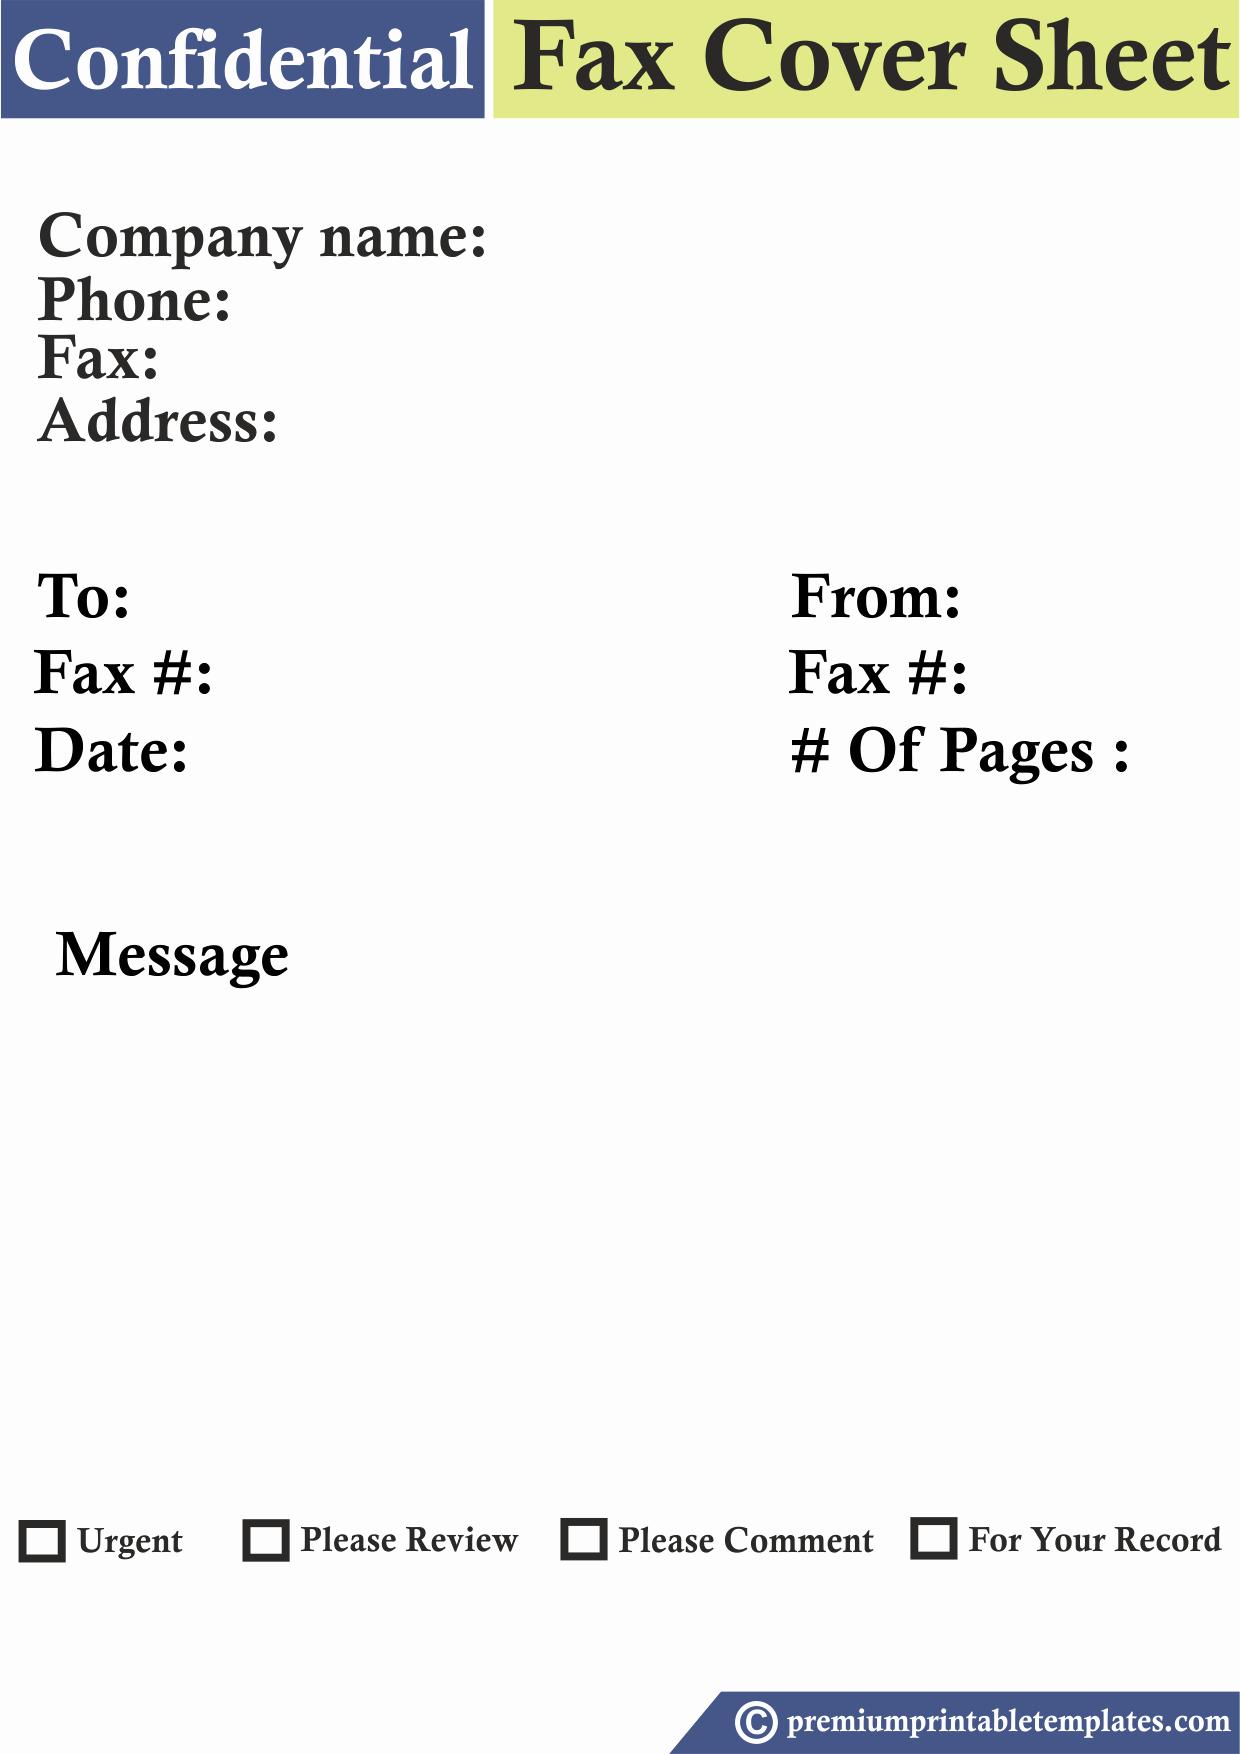 Fax Cover Sheet Confidential Fresh Confidential Fax Cover Sheet Templates – Premium Printable